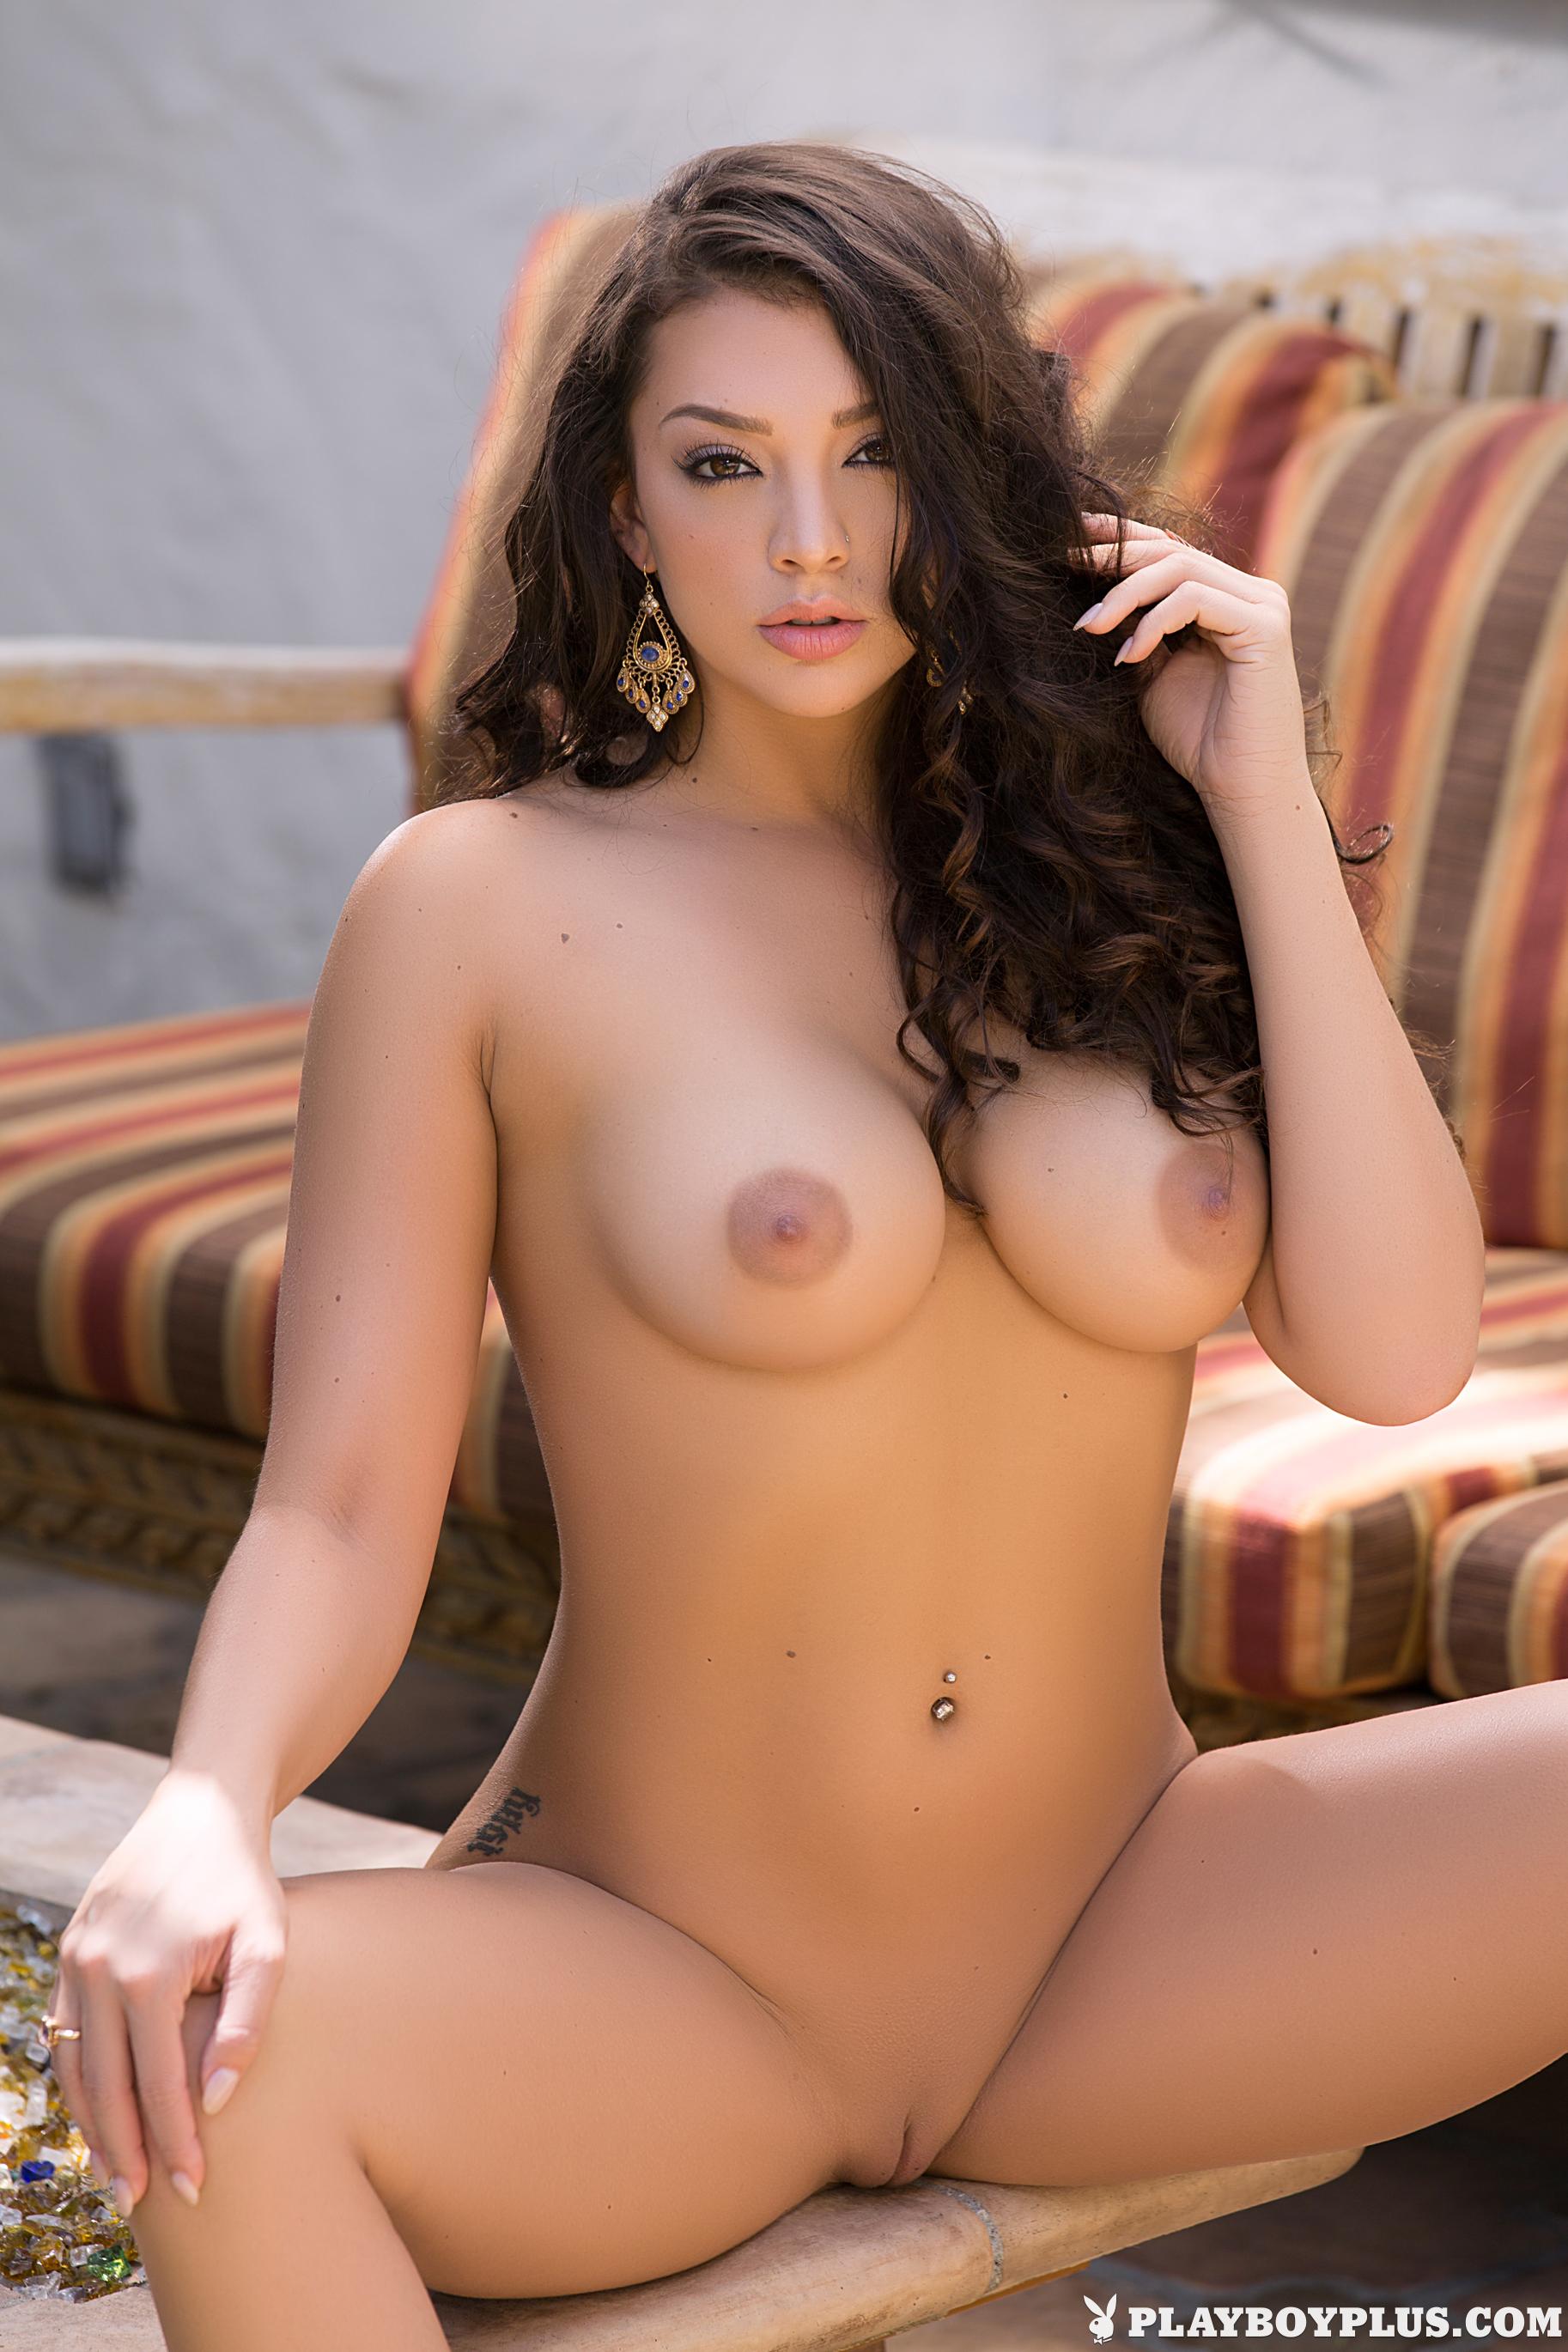 Sophia presley playboy